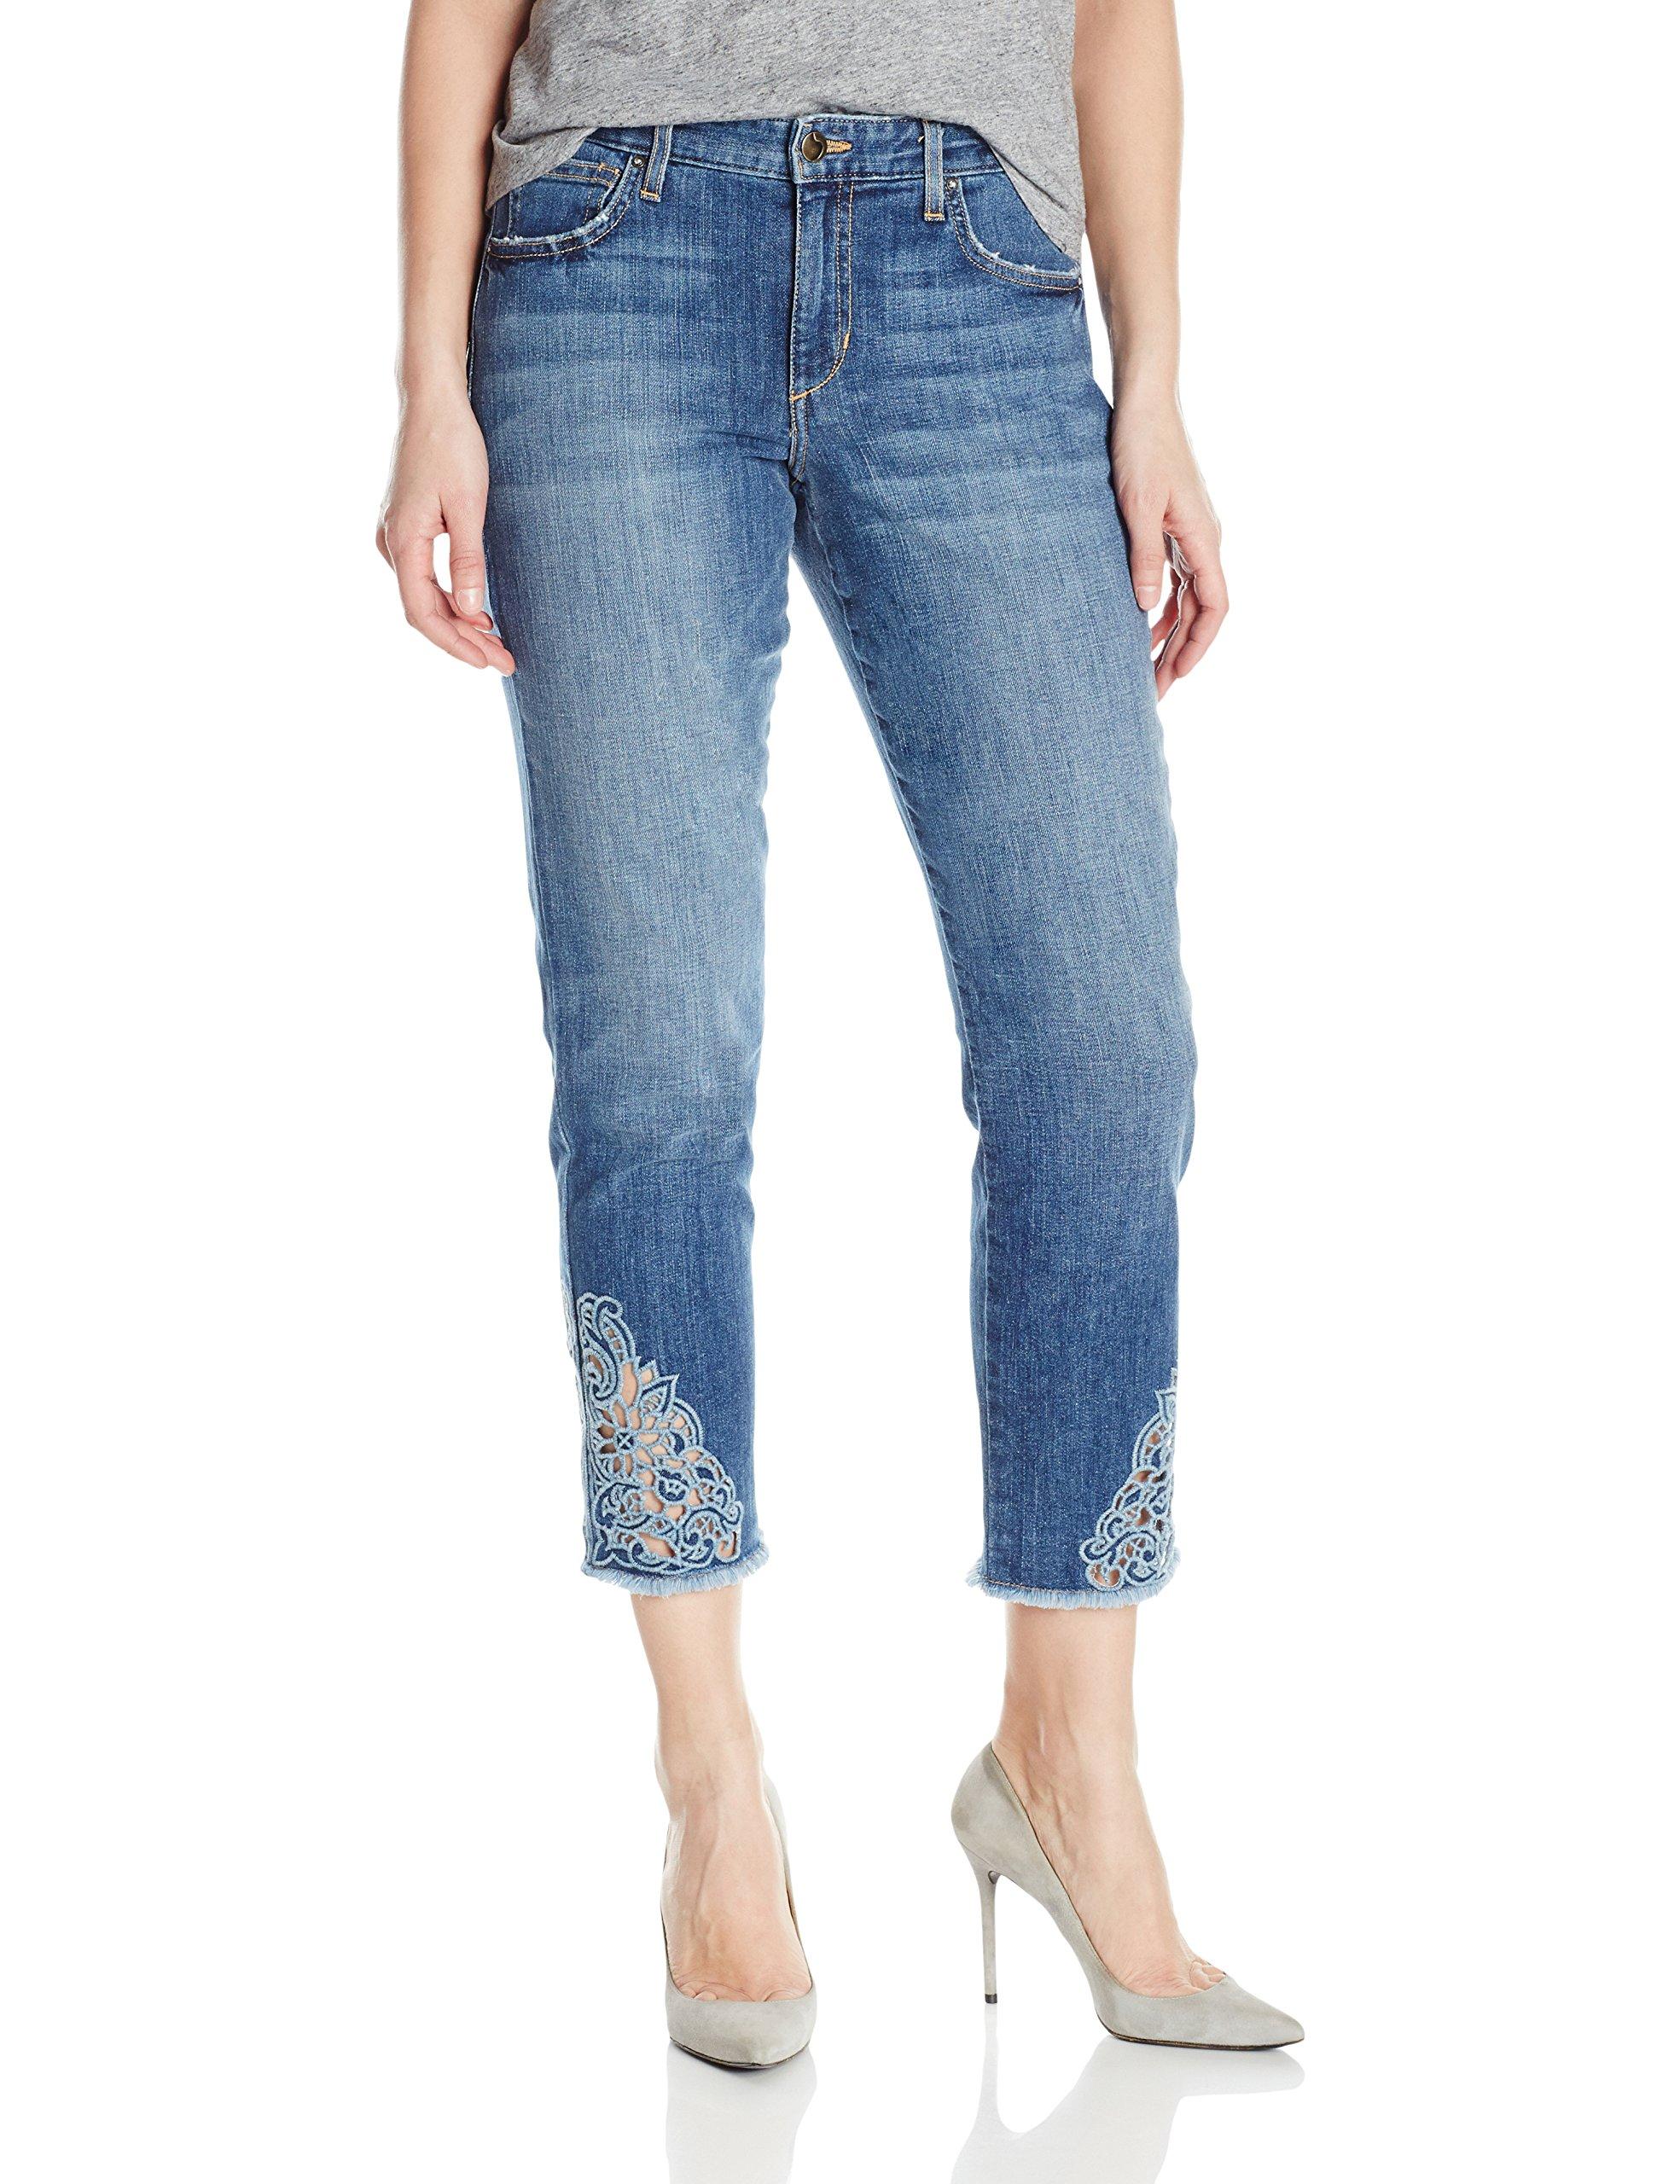 Joe's Jeans Women's Smith Midrise Straight Crop Jean, Nixie, 29